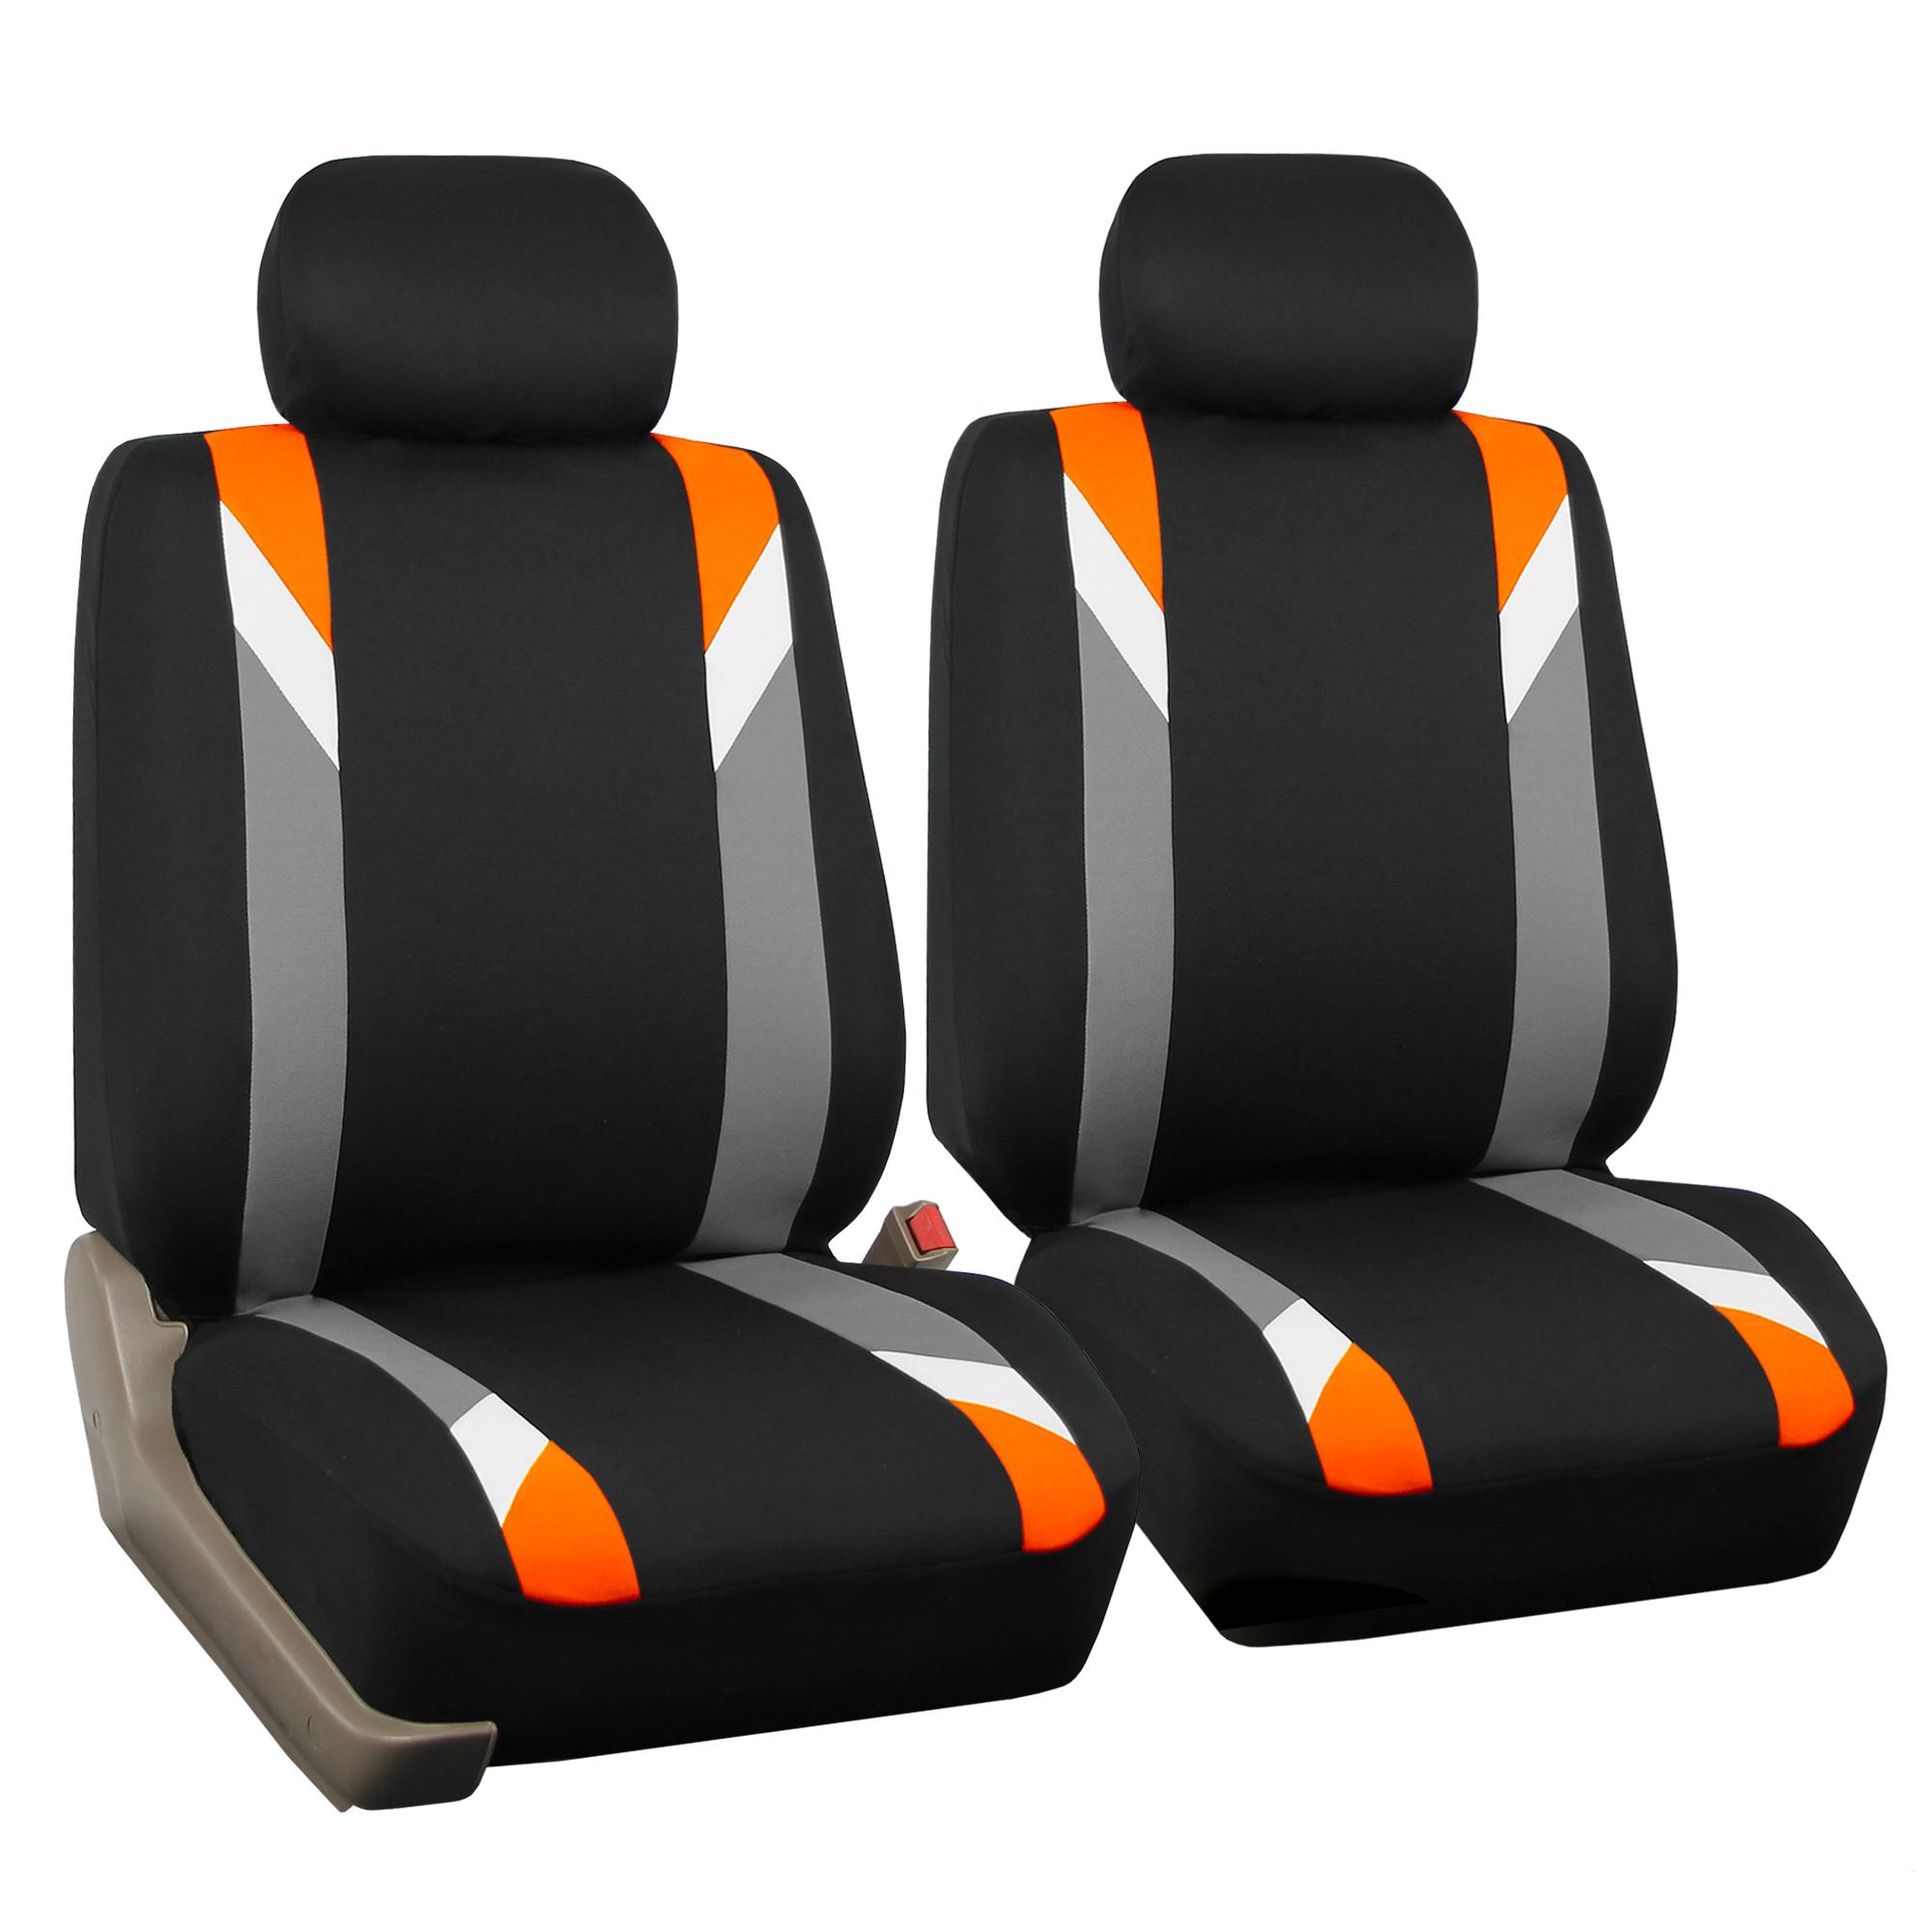 car seat cover set for auto sporty orange w 5 headrests ebay. Black Bedroom Furniture Sets. Home Design Ideas